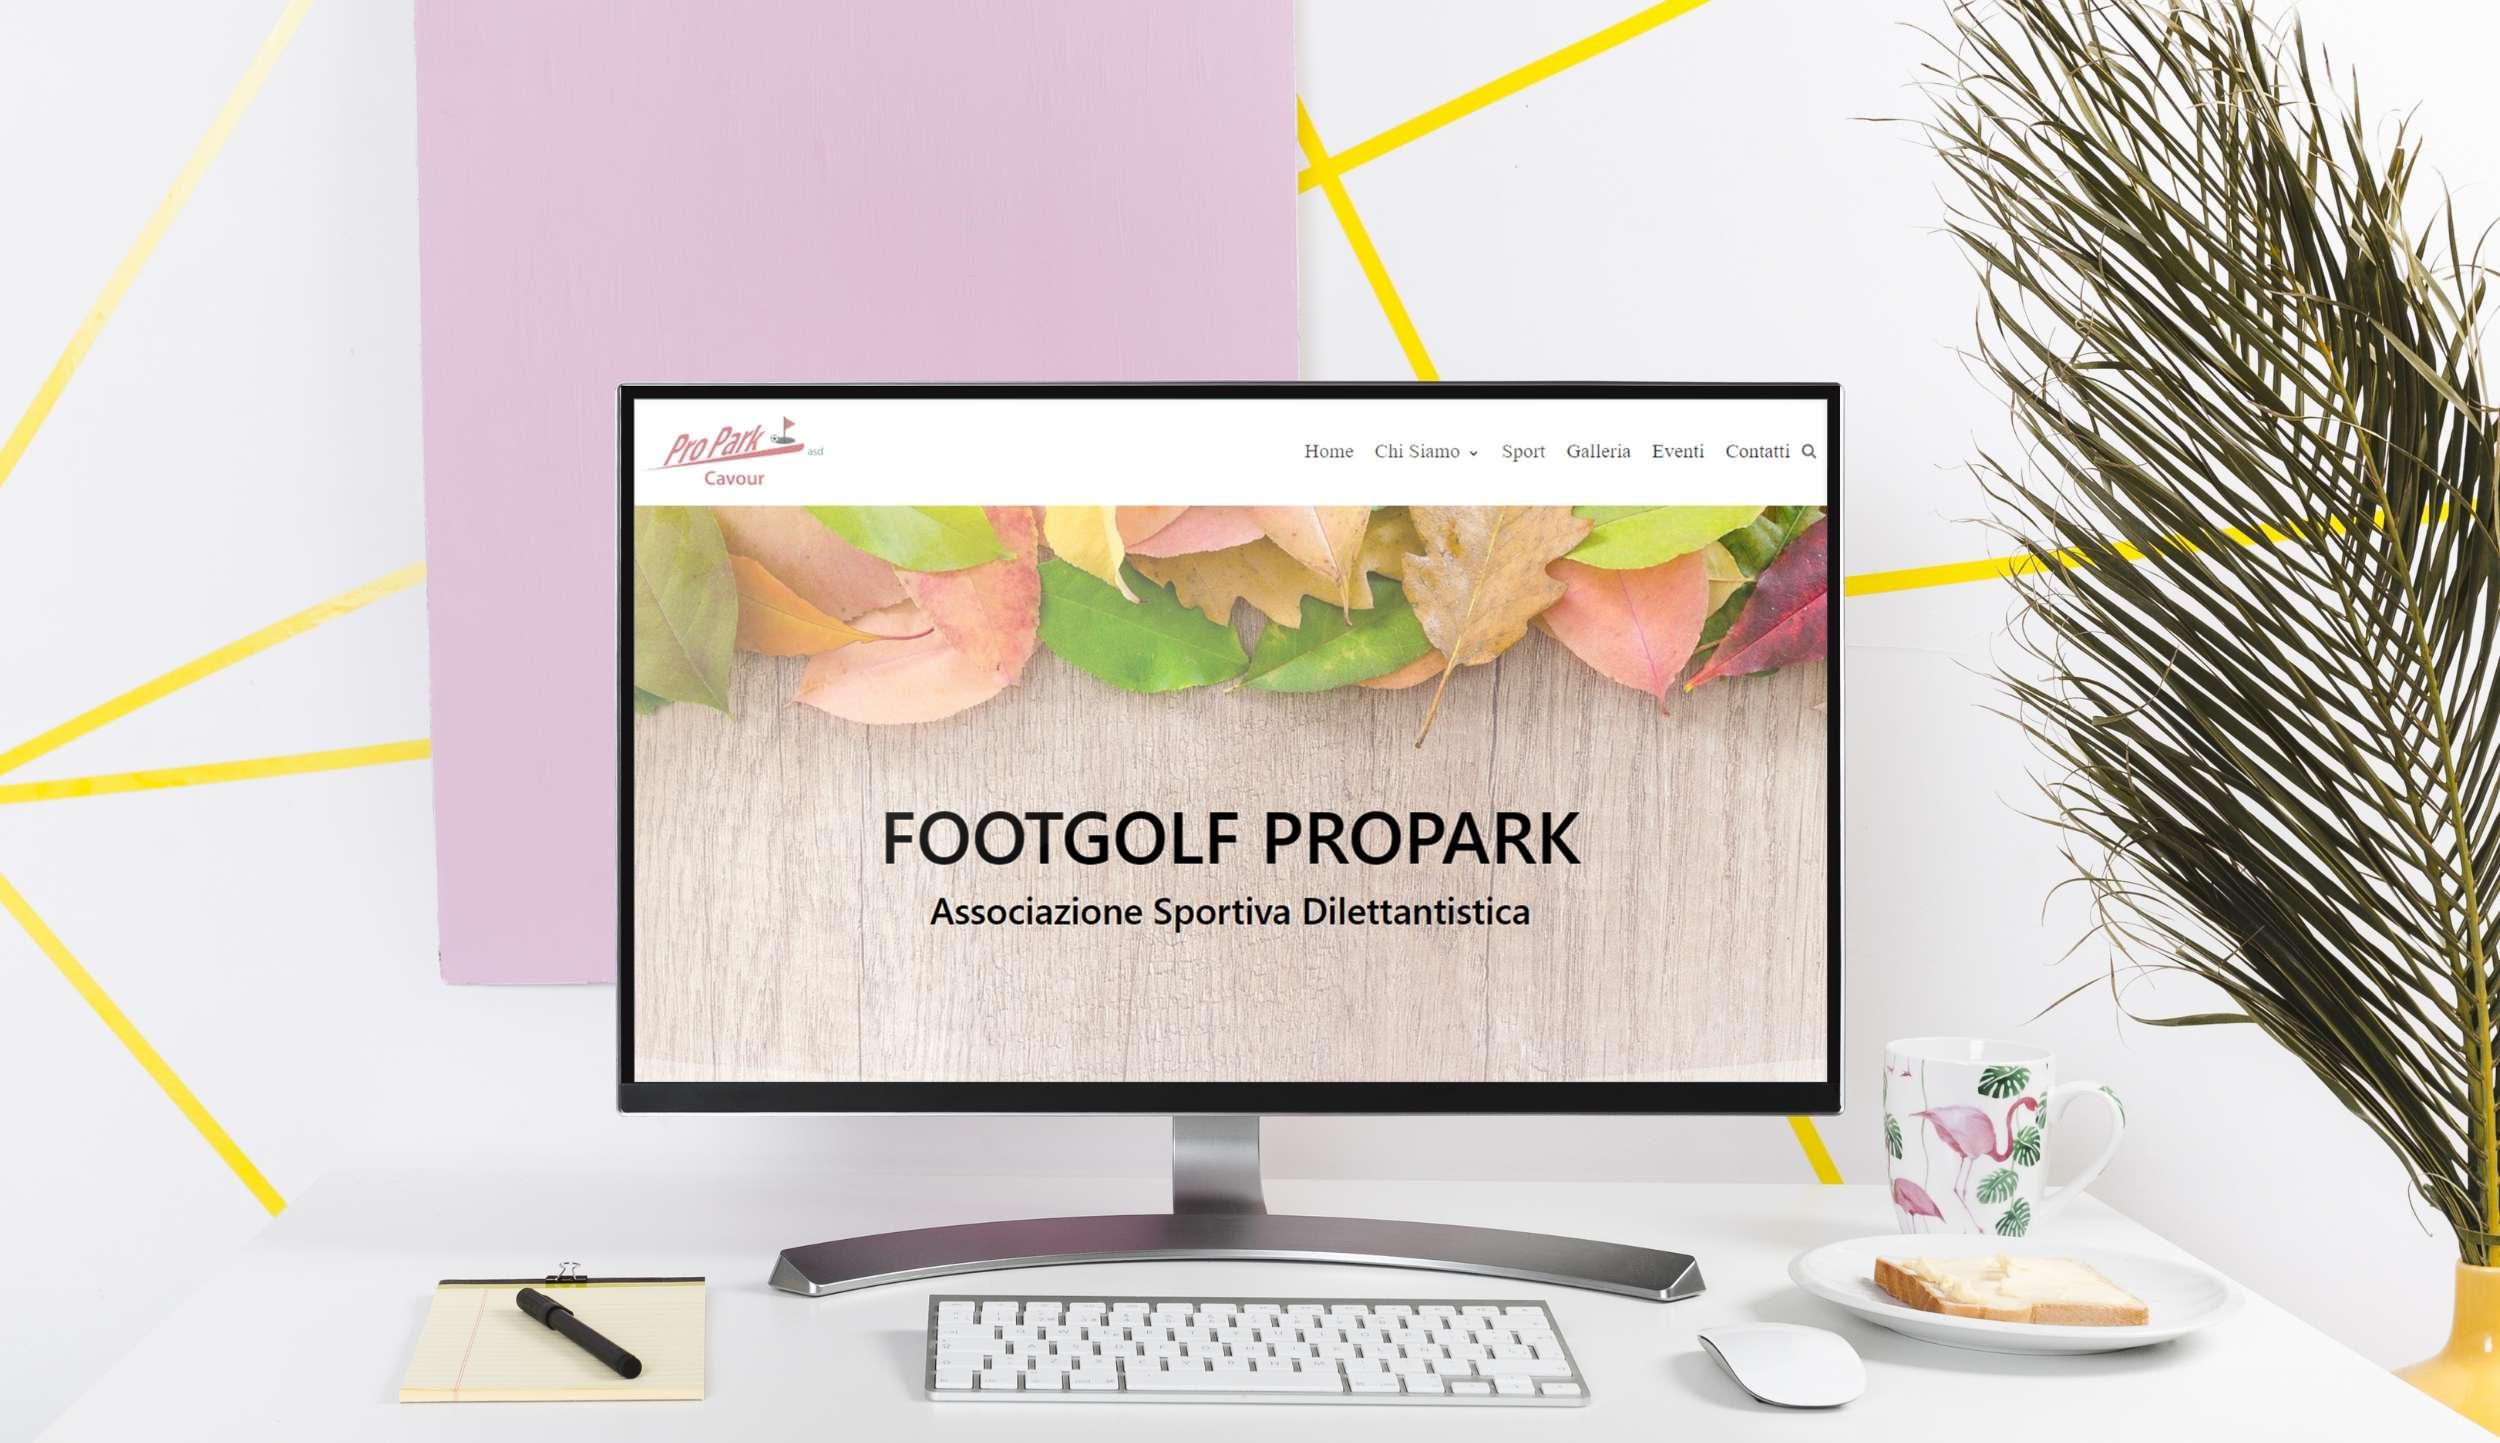 Mockup Propark Cavour